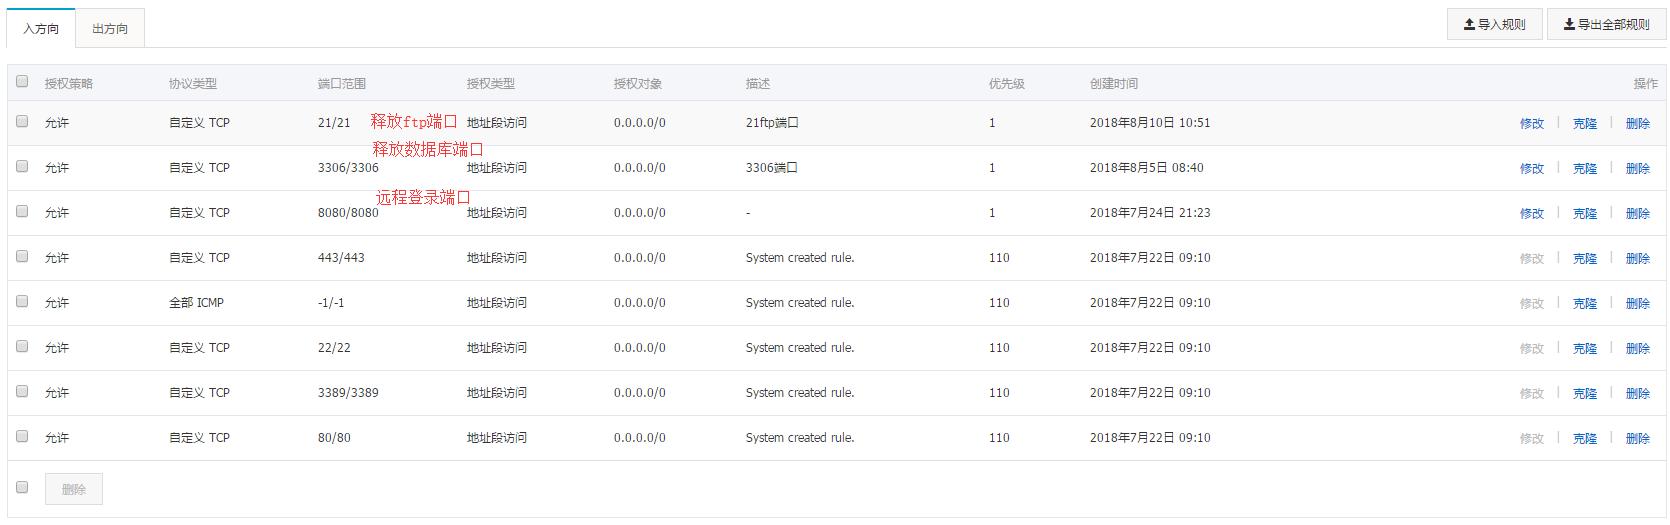 ECS Windows 2012如何修改远程桌面端口